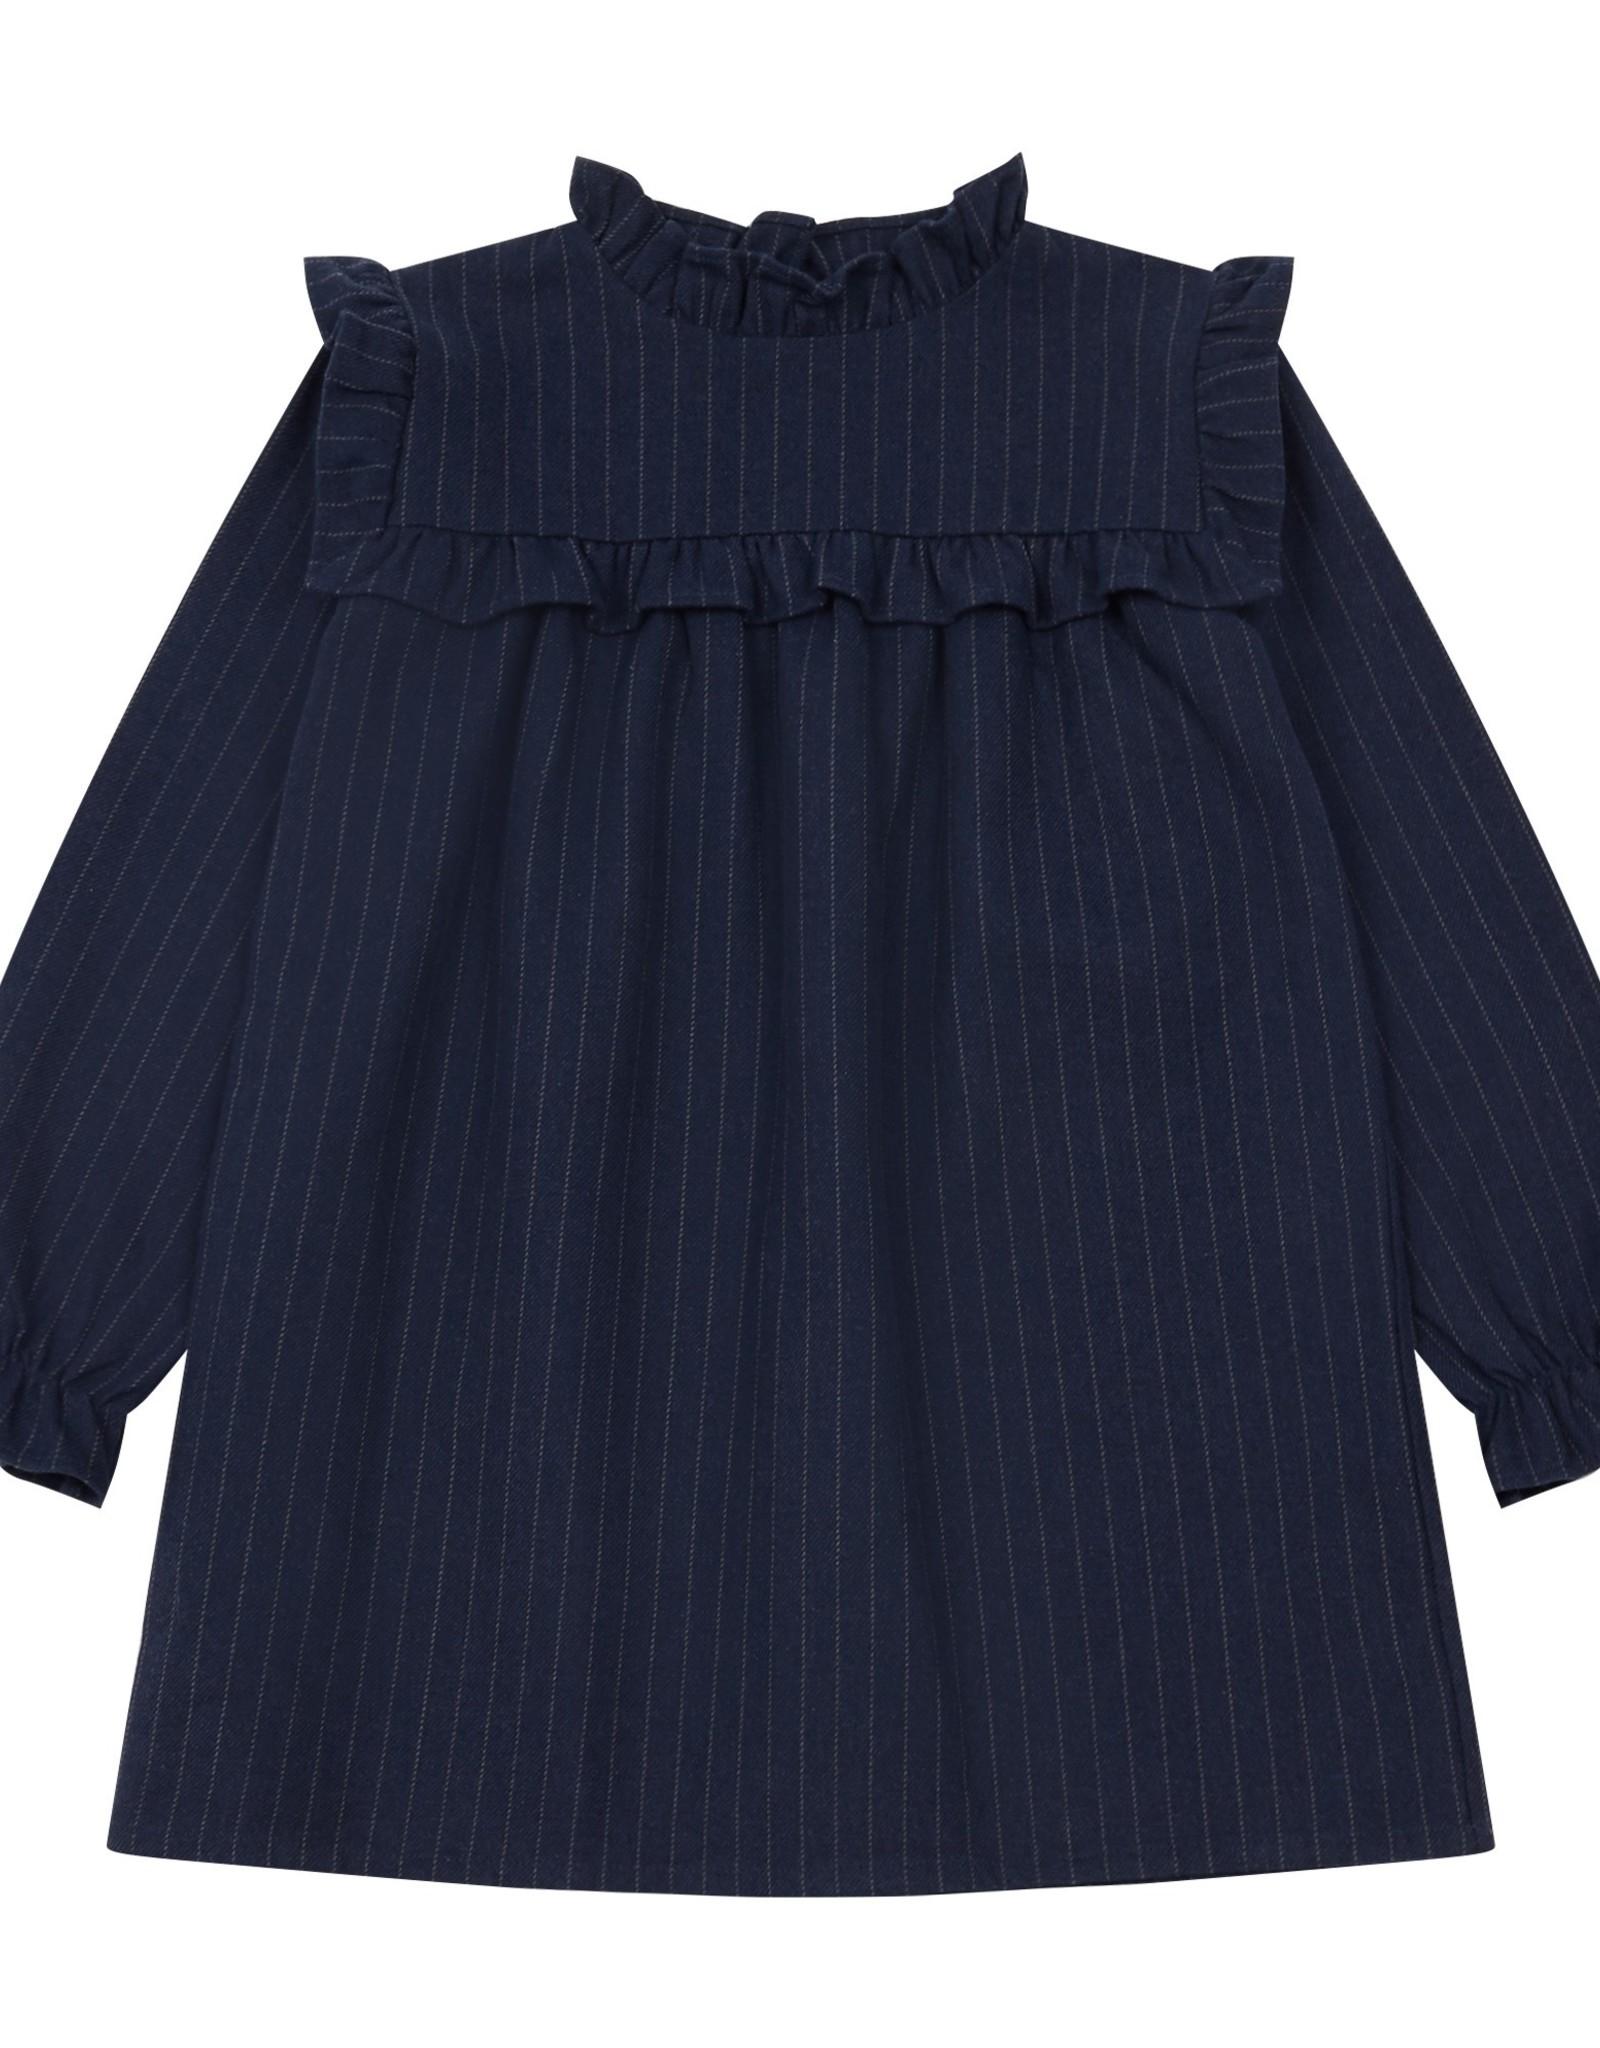 Louis Louise Annick dress